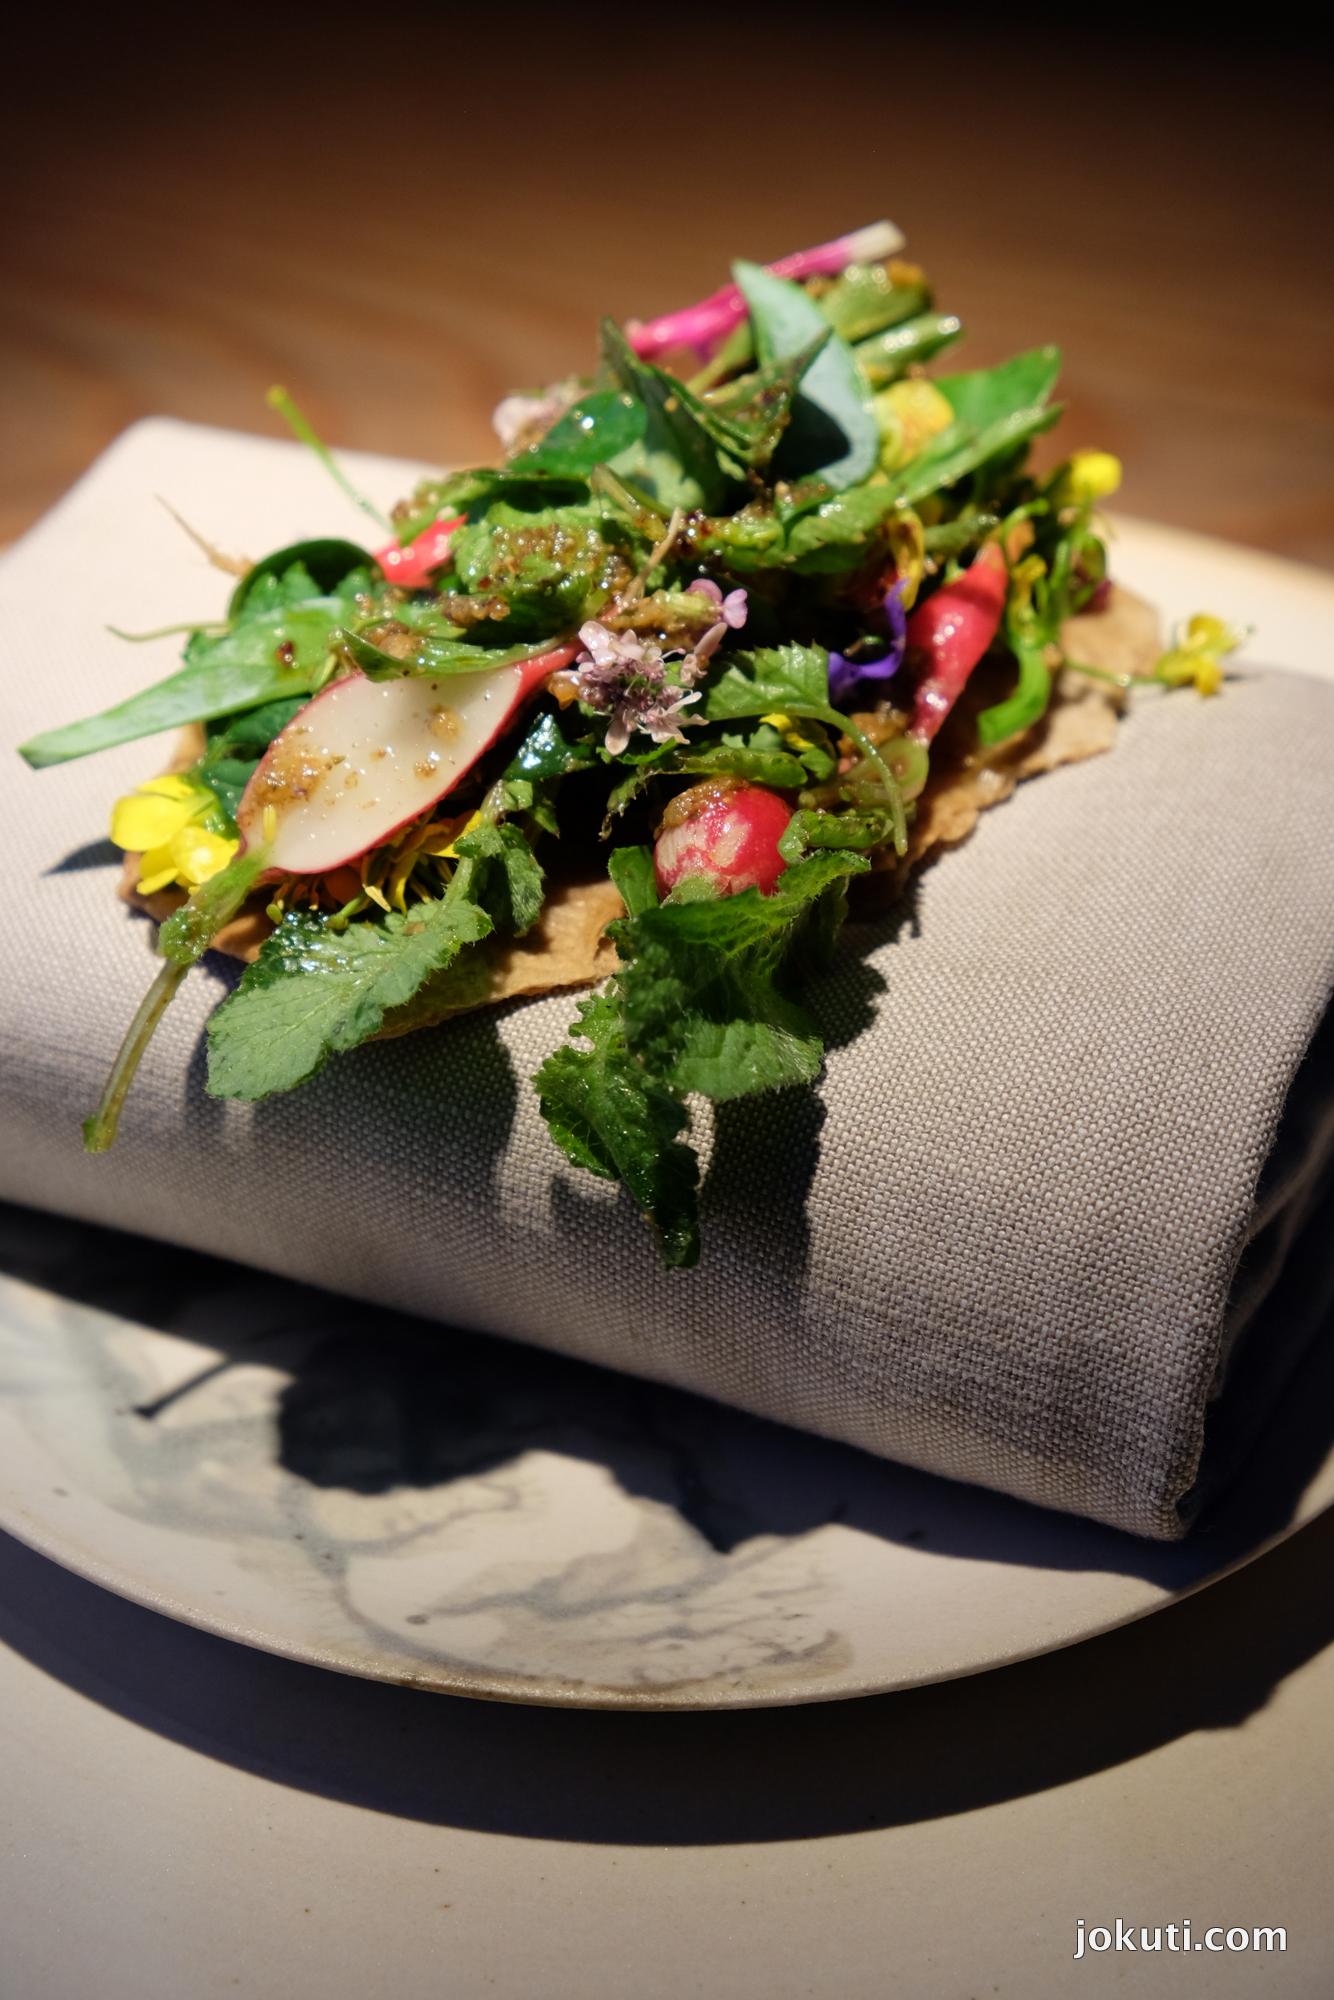 dscf6210_noma_vegetables_menu_2018_redzepi_copenhagen_worlds50best_vilagevo_jokuti.jpg